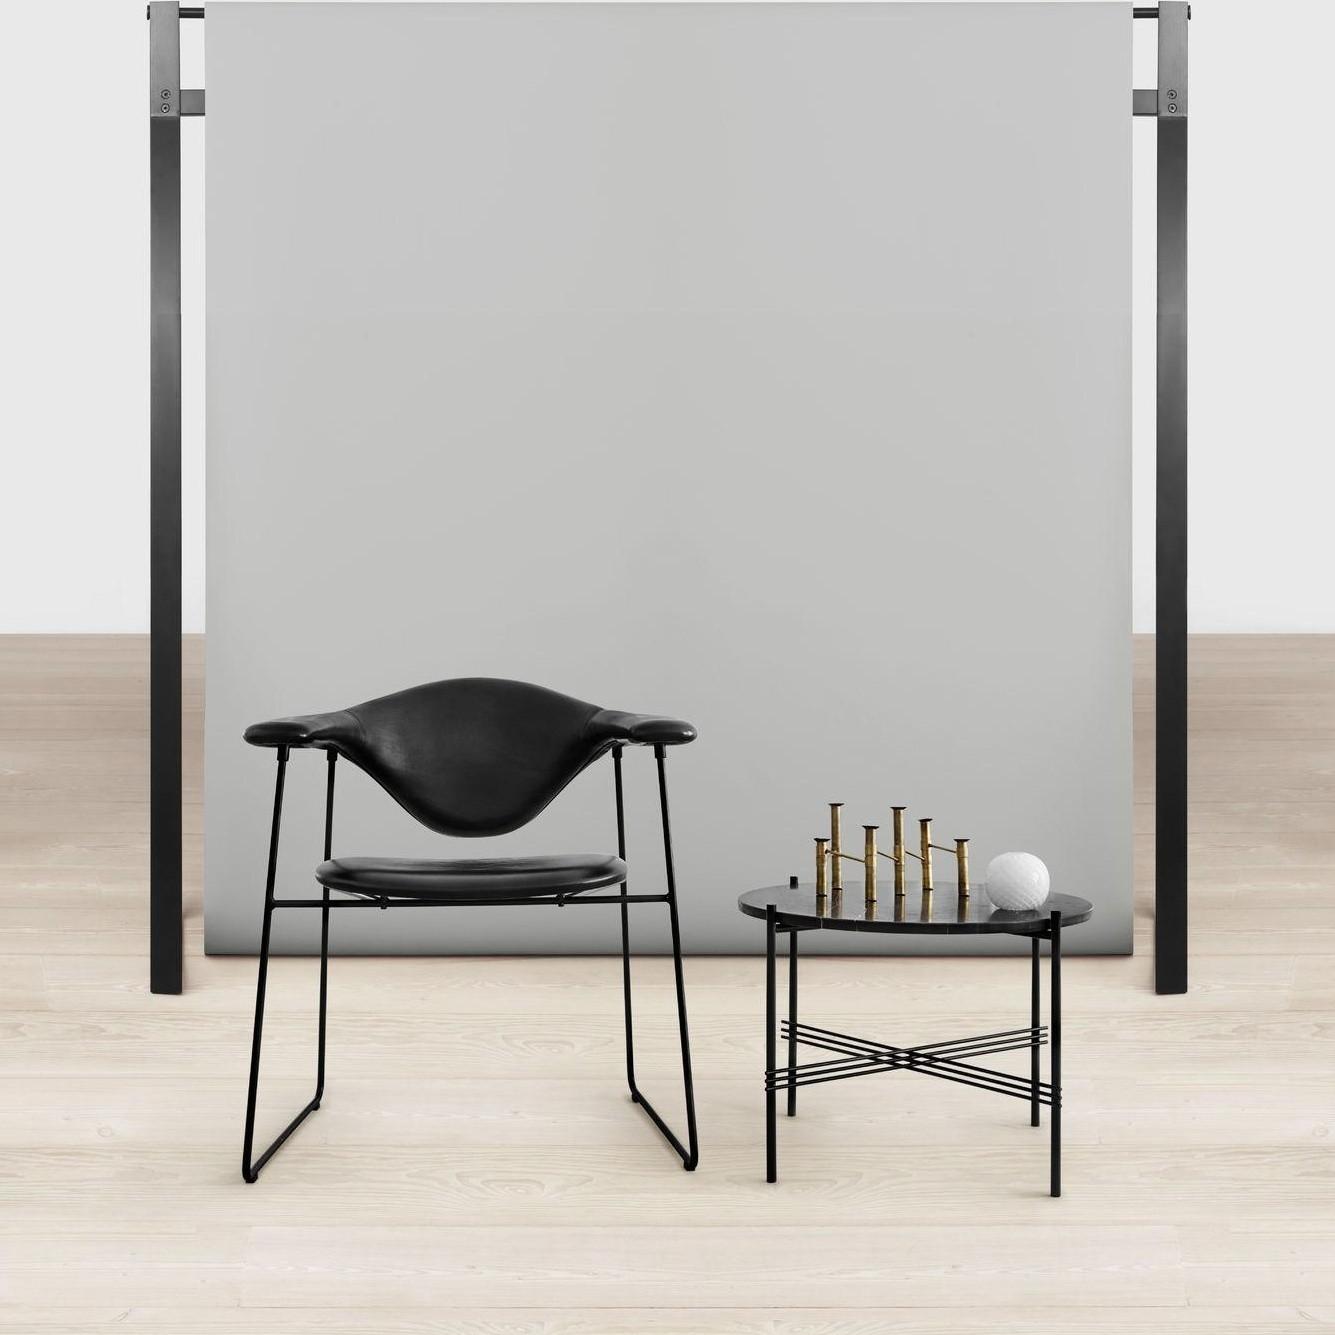 Gubi Masculo Lounge Chair Ambientedirect